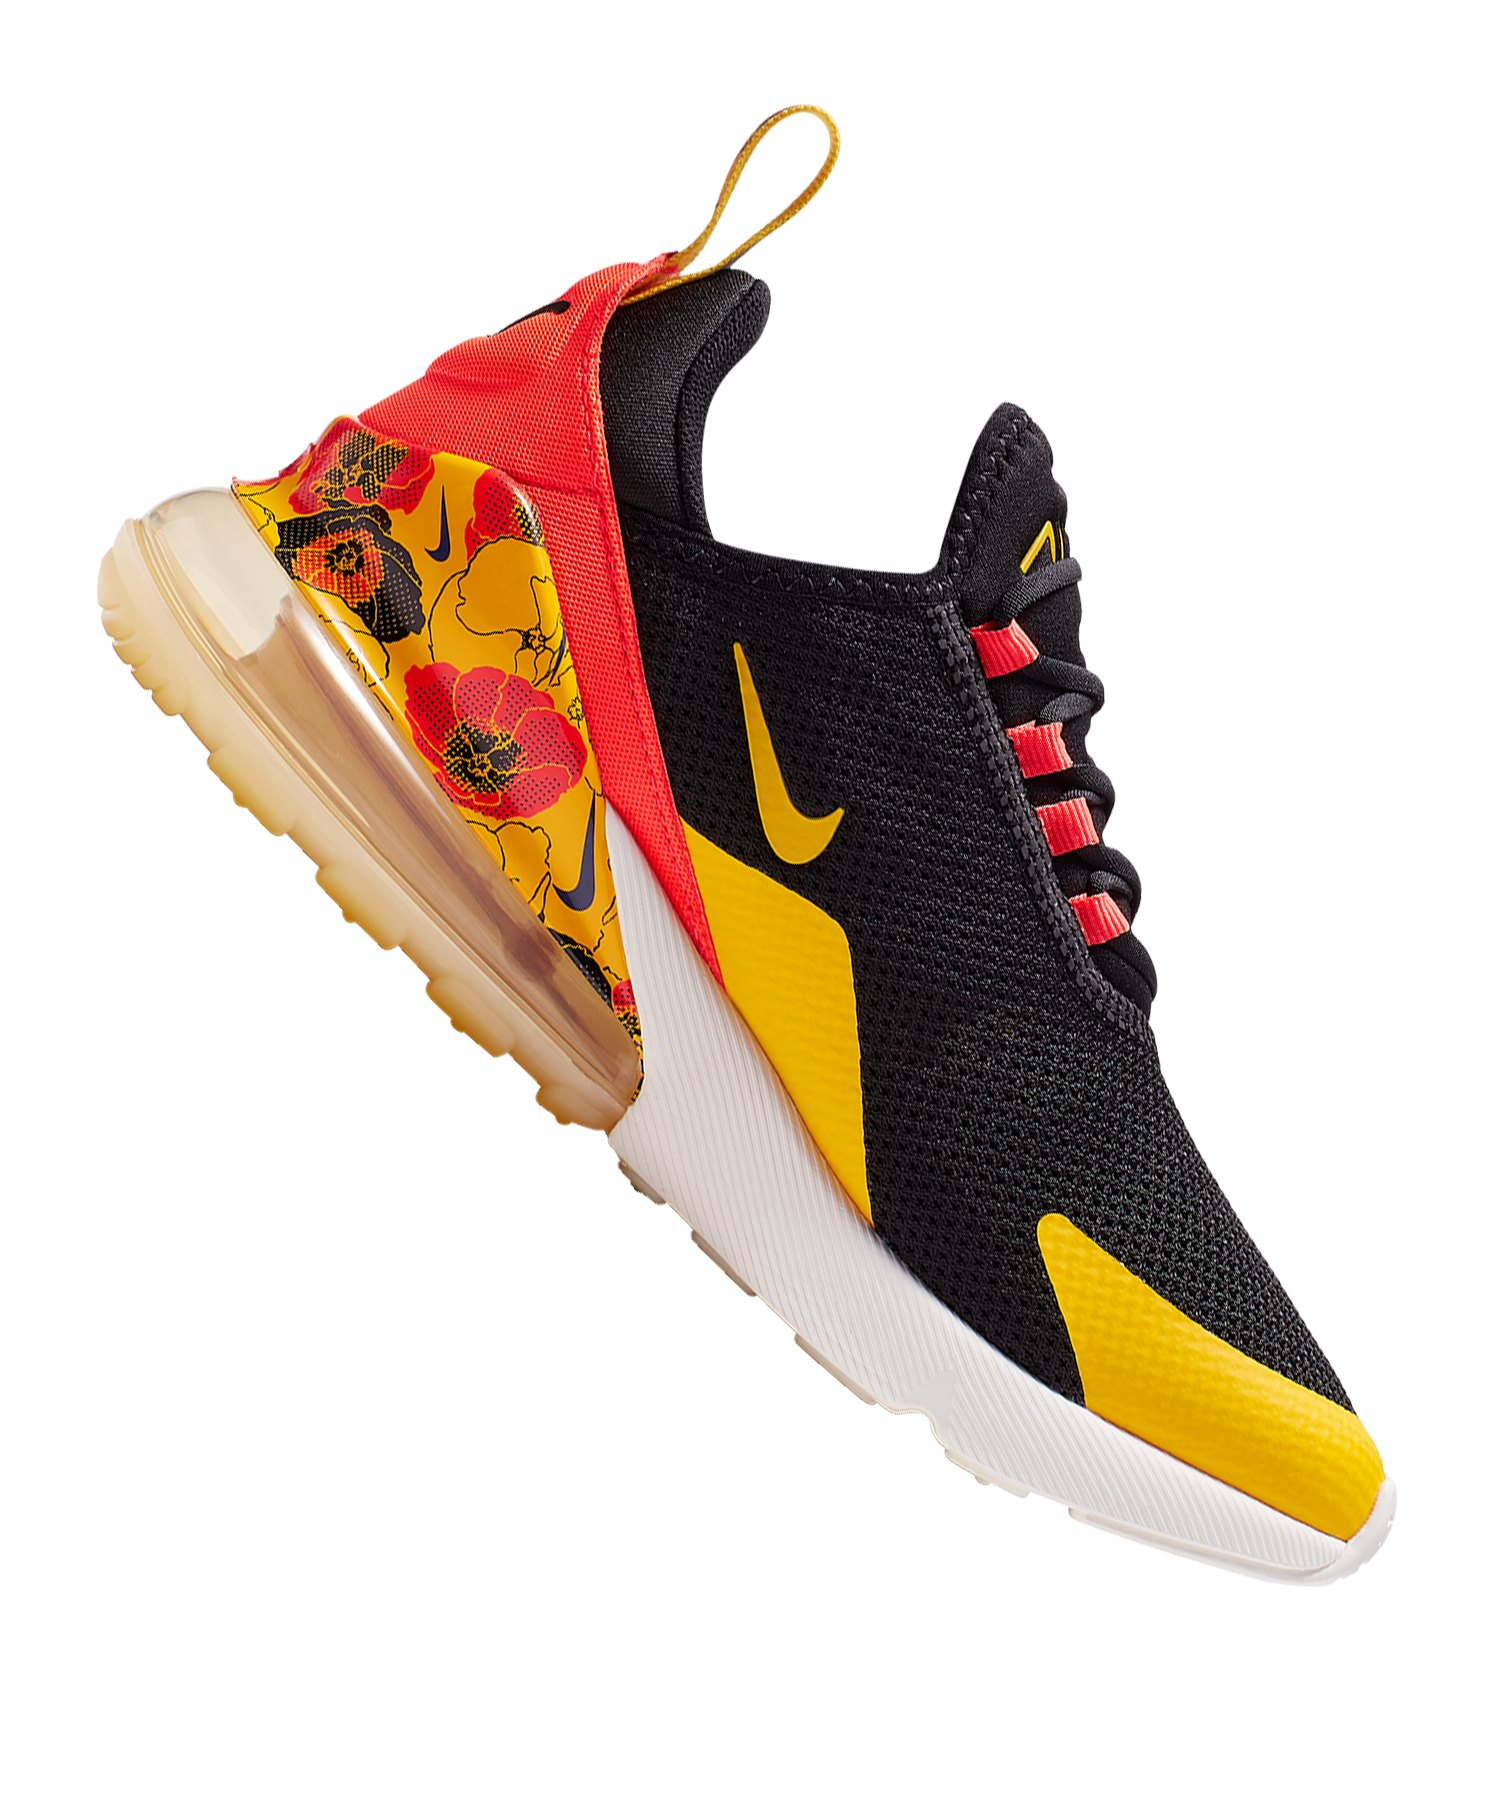 F005 Se Sneaker Air 270 Nike Max Damen XPikZu